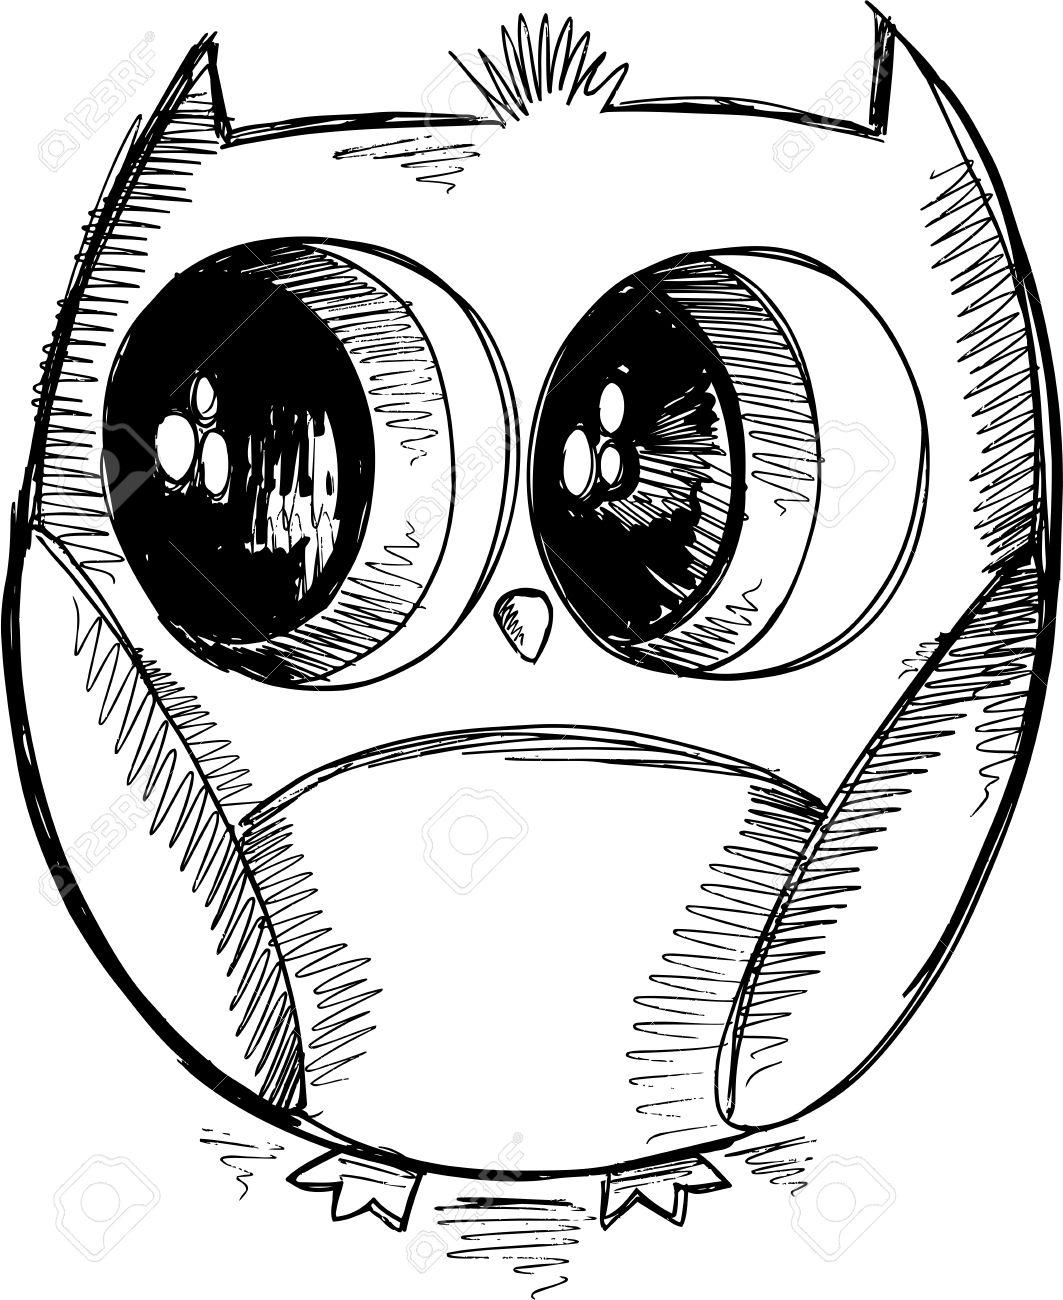 Cute Owl Drawing At Getdrawings